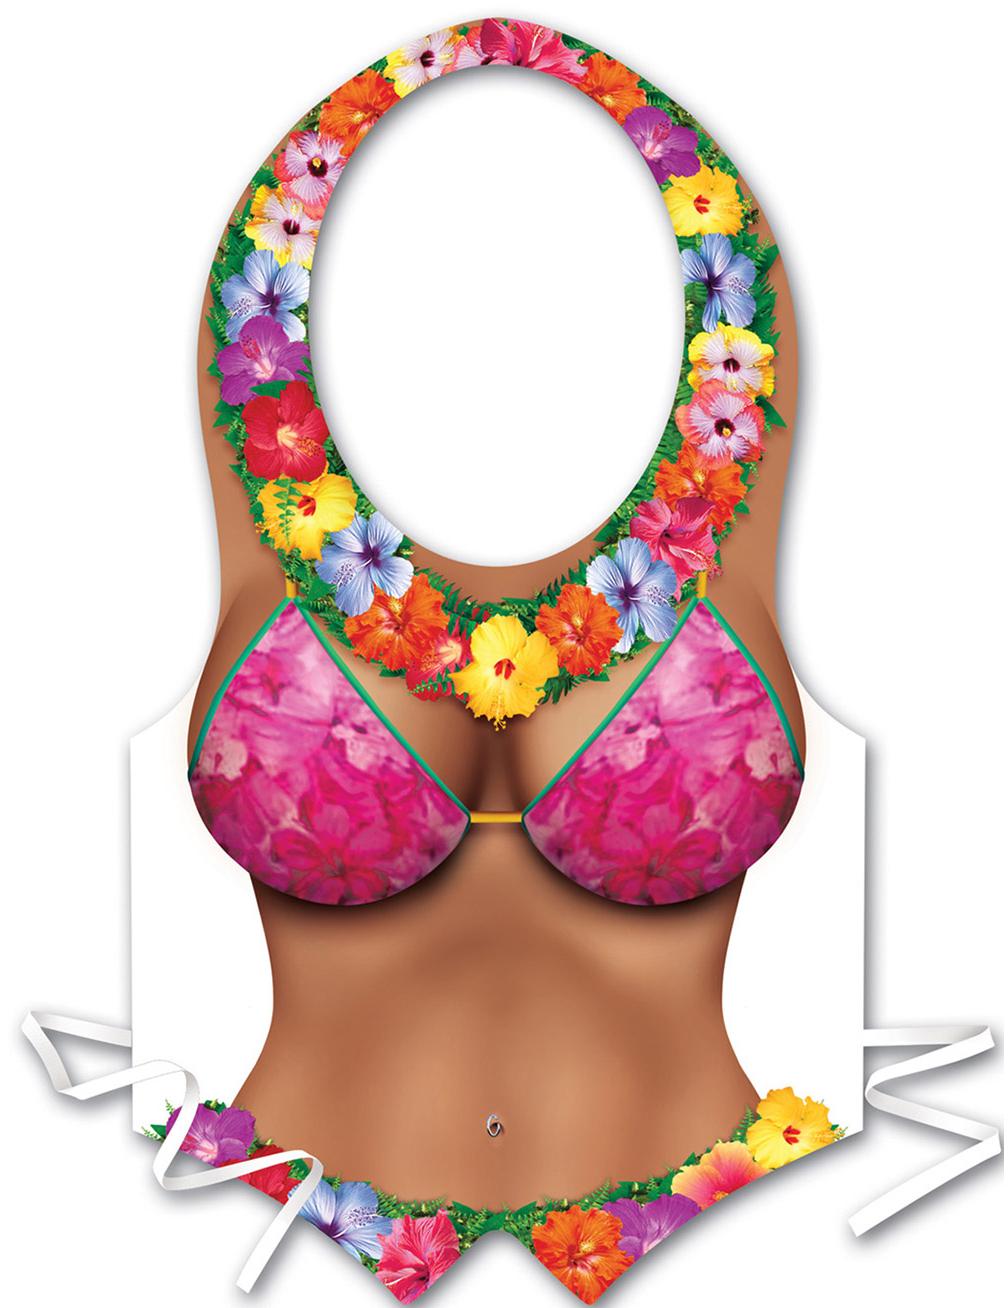 Sexy Schürze Hawaii Frau Für Damen Bunt Günstige Faschings